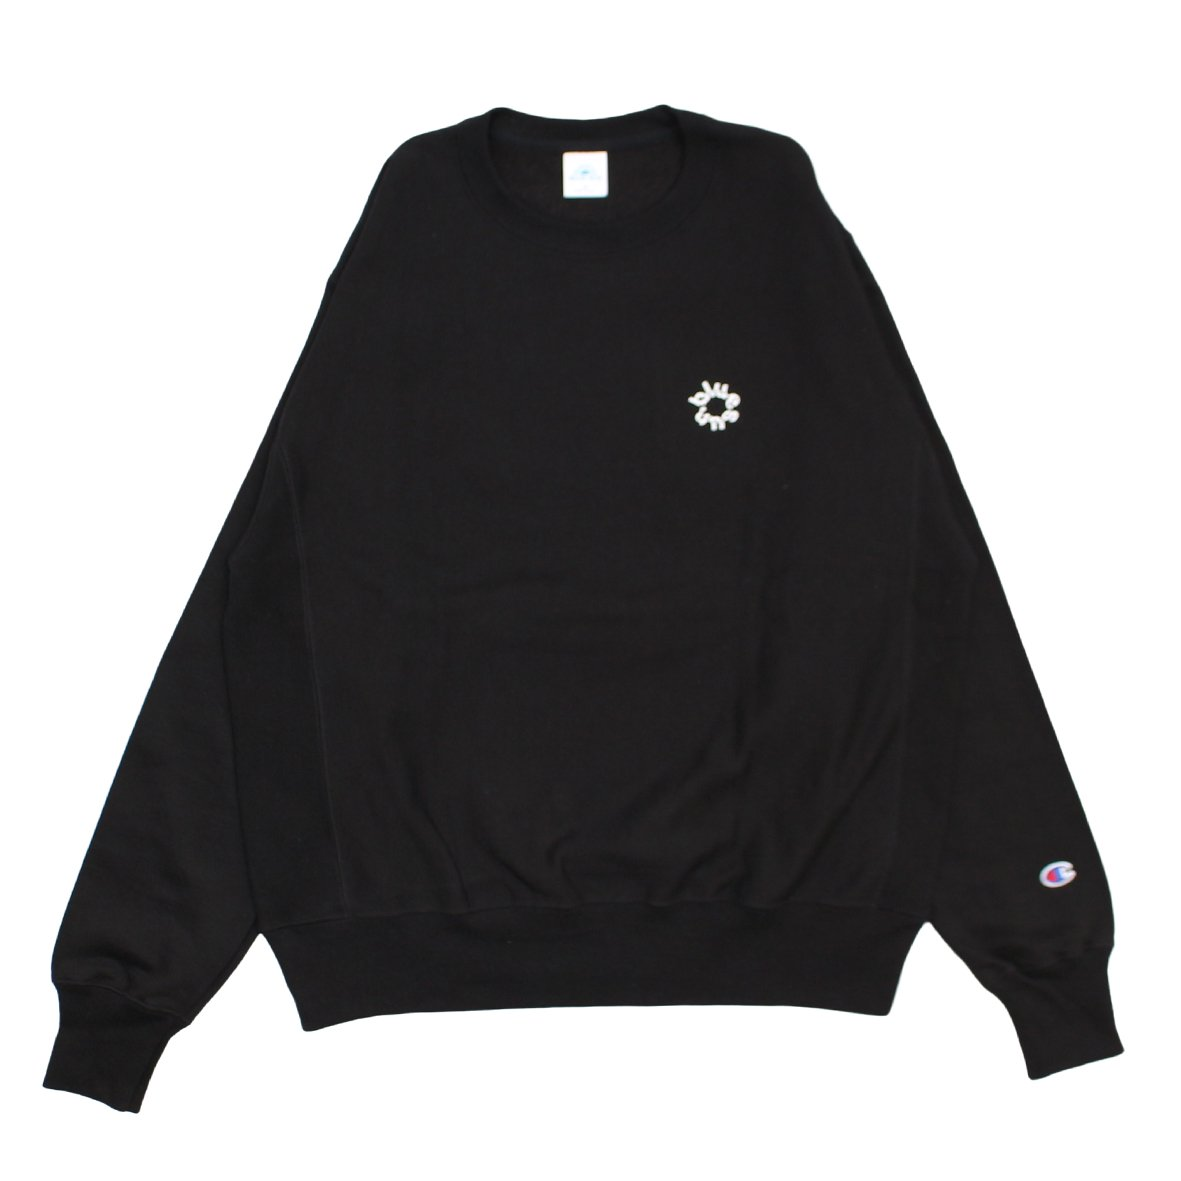 TWIST CREWNECK SWEATSHIRT 【BLACK】